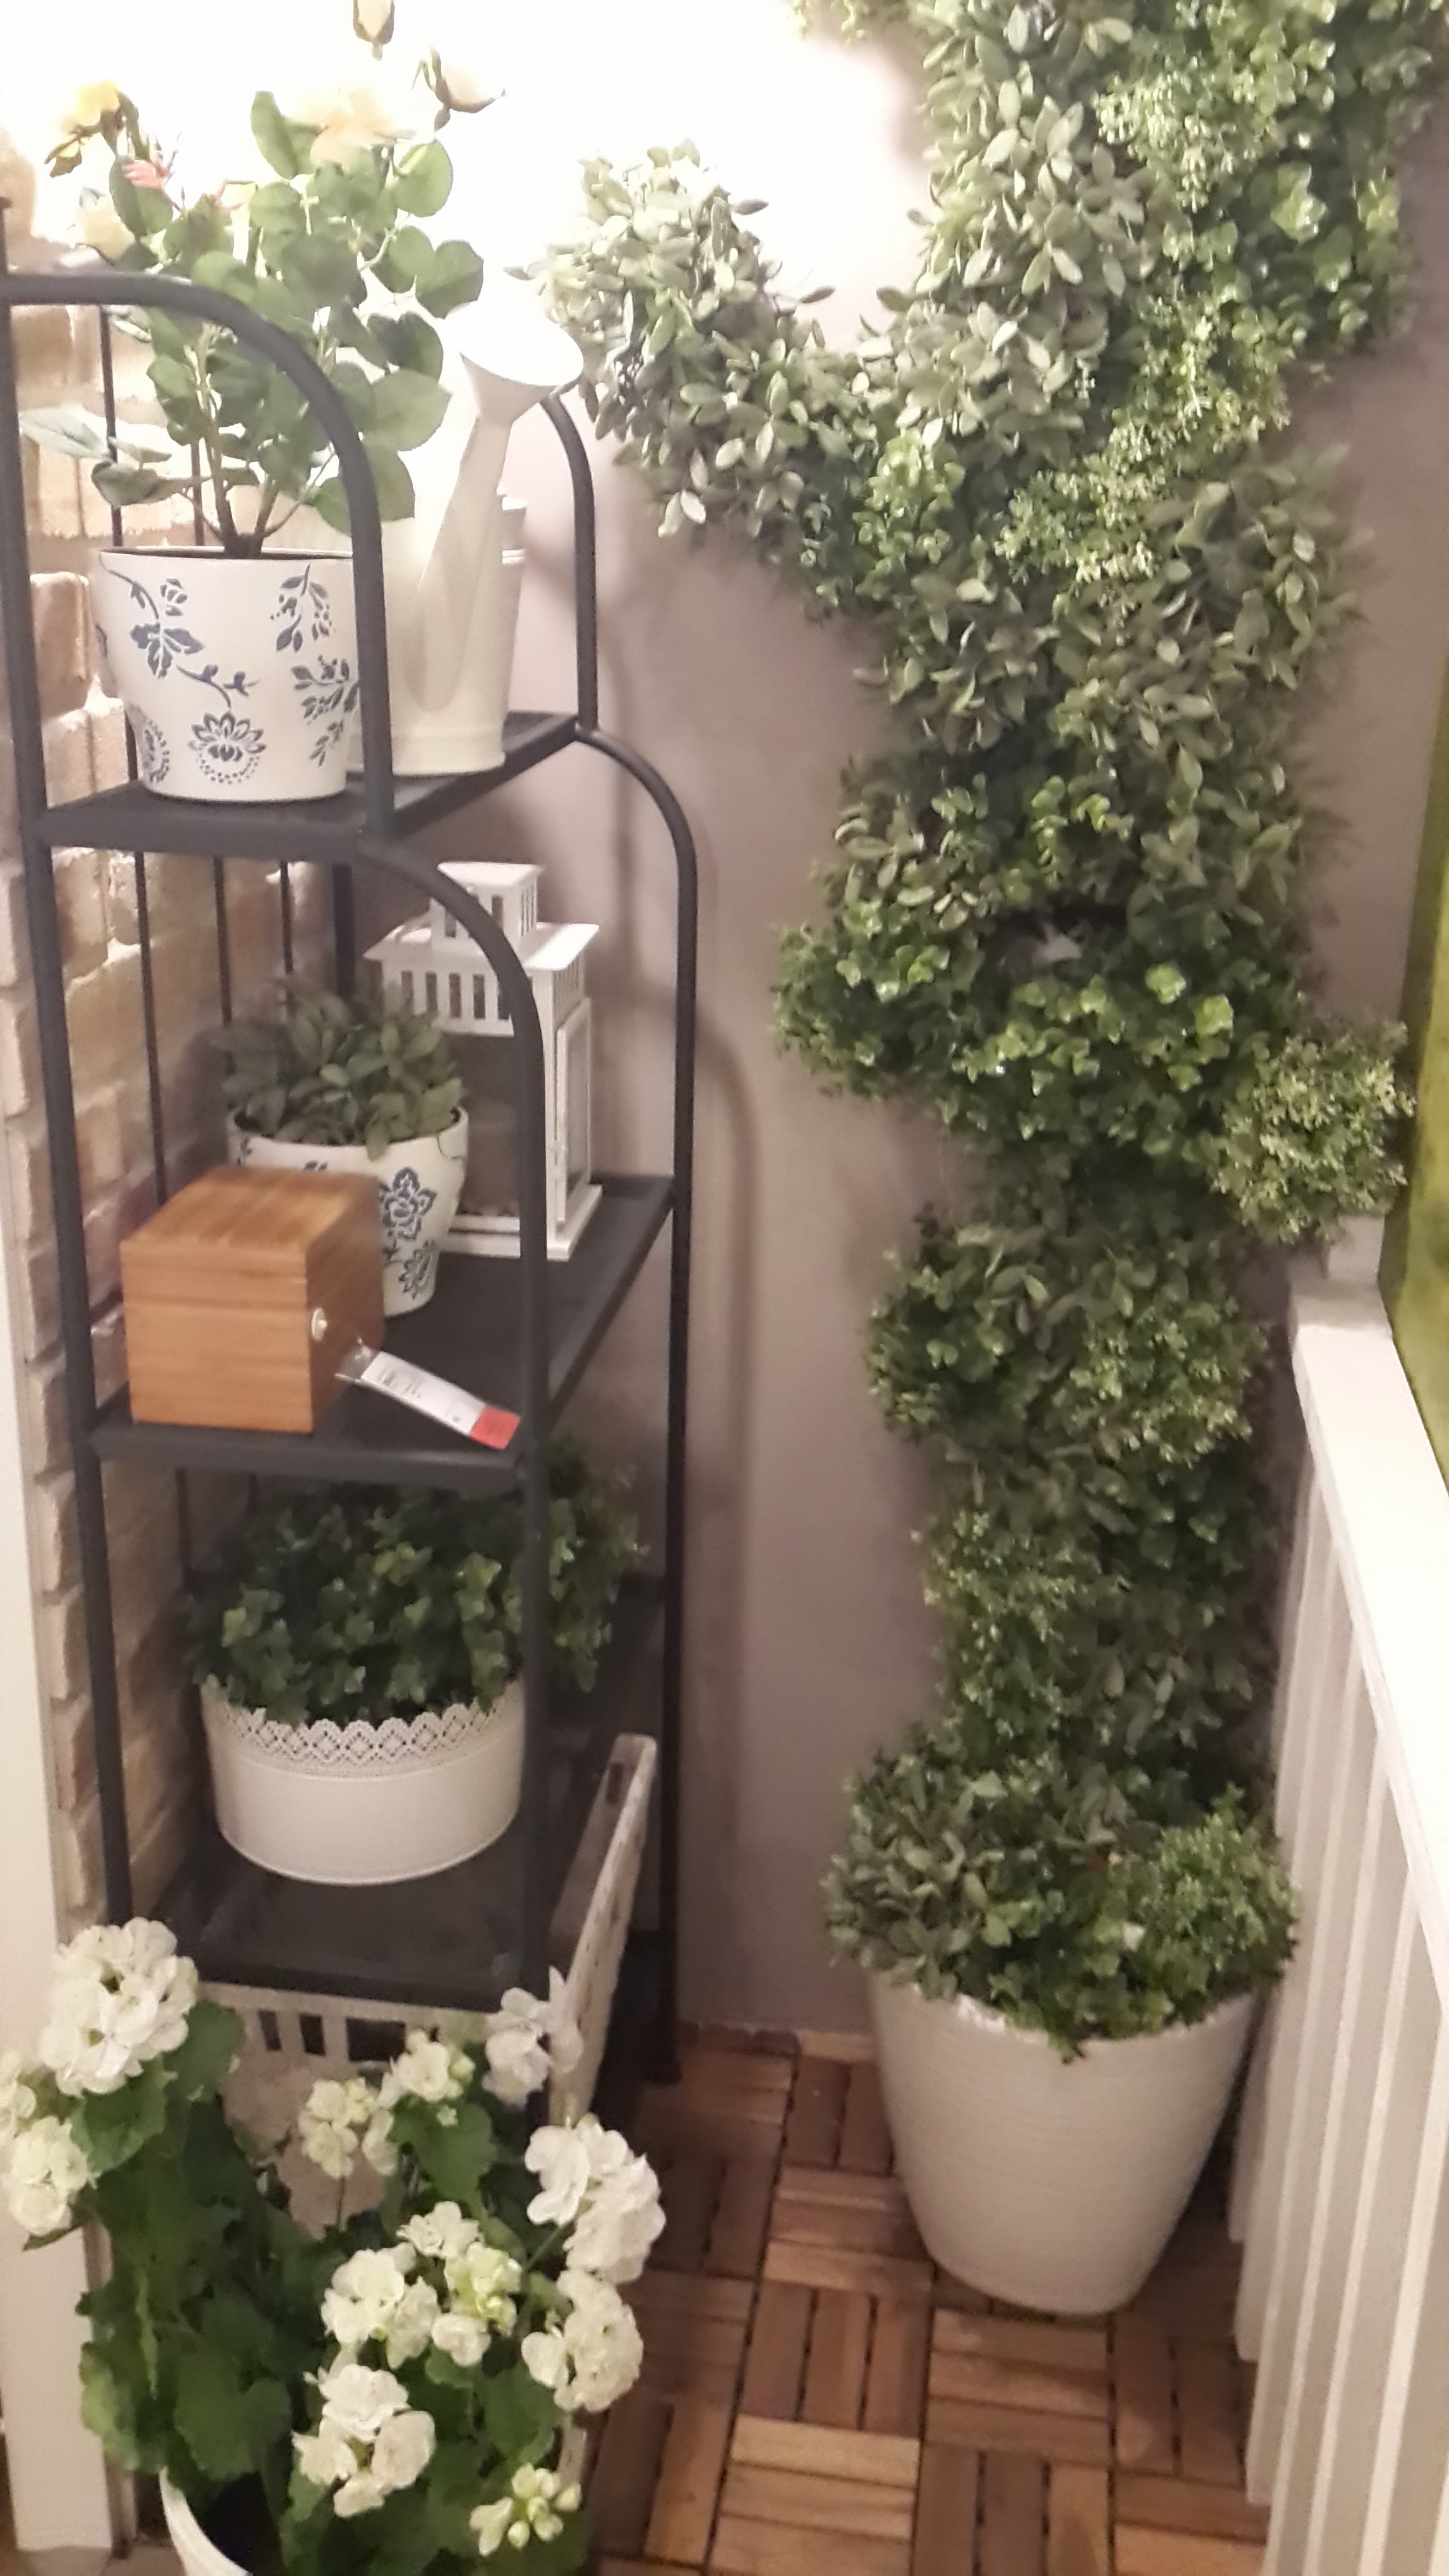 Ikea Small Balcony Decorating Ideas: IKEA Please Come To Kenya